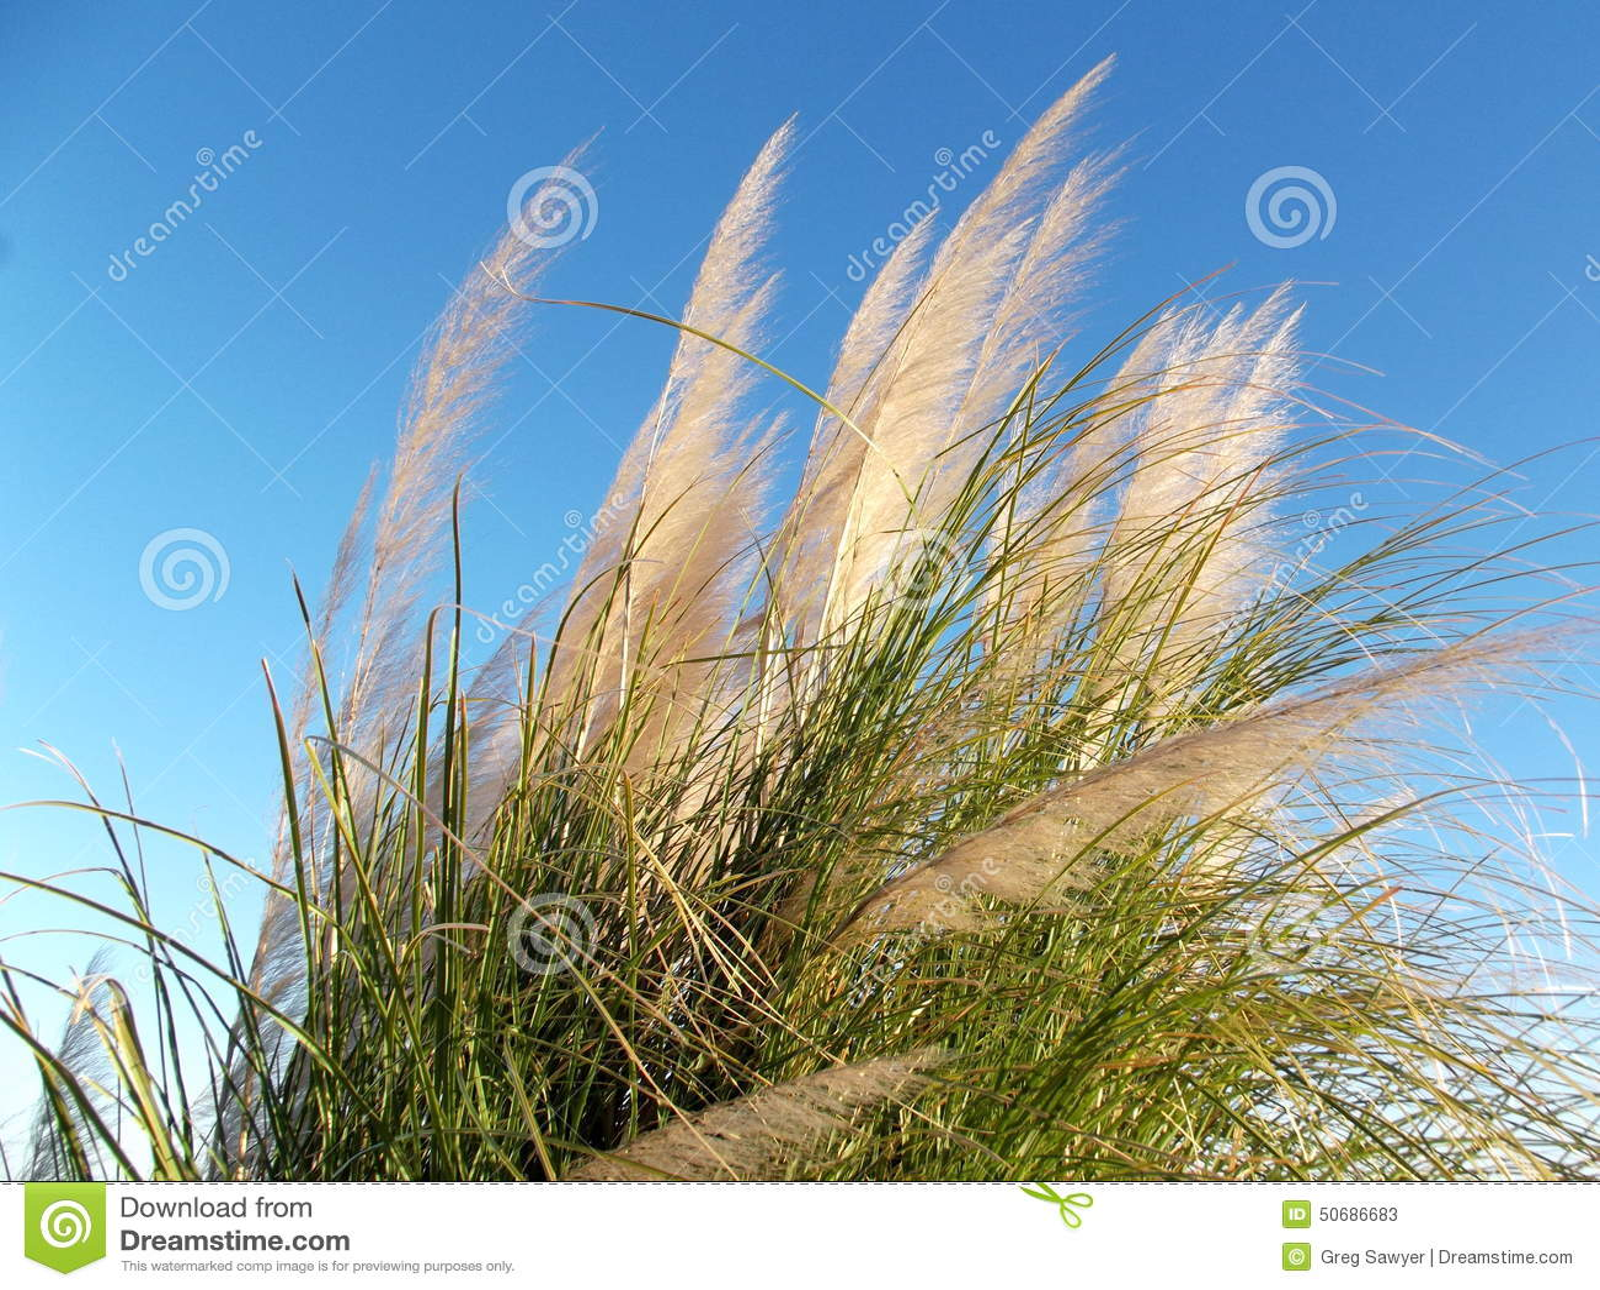 Download 在风的野草在蓝色早晨天空 库存图片. 图片 包括有 增长, 早晨, 庭院, 自由, 自然, 线路, 冬天 - 50686683